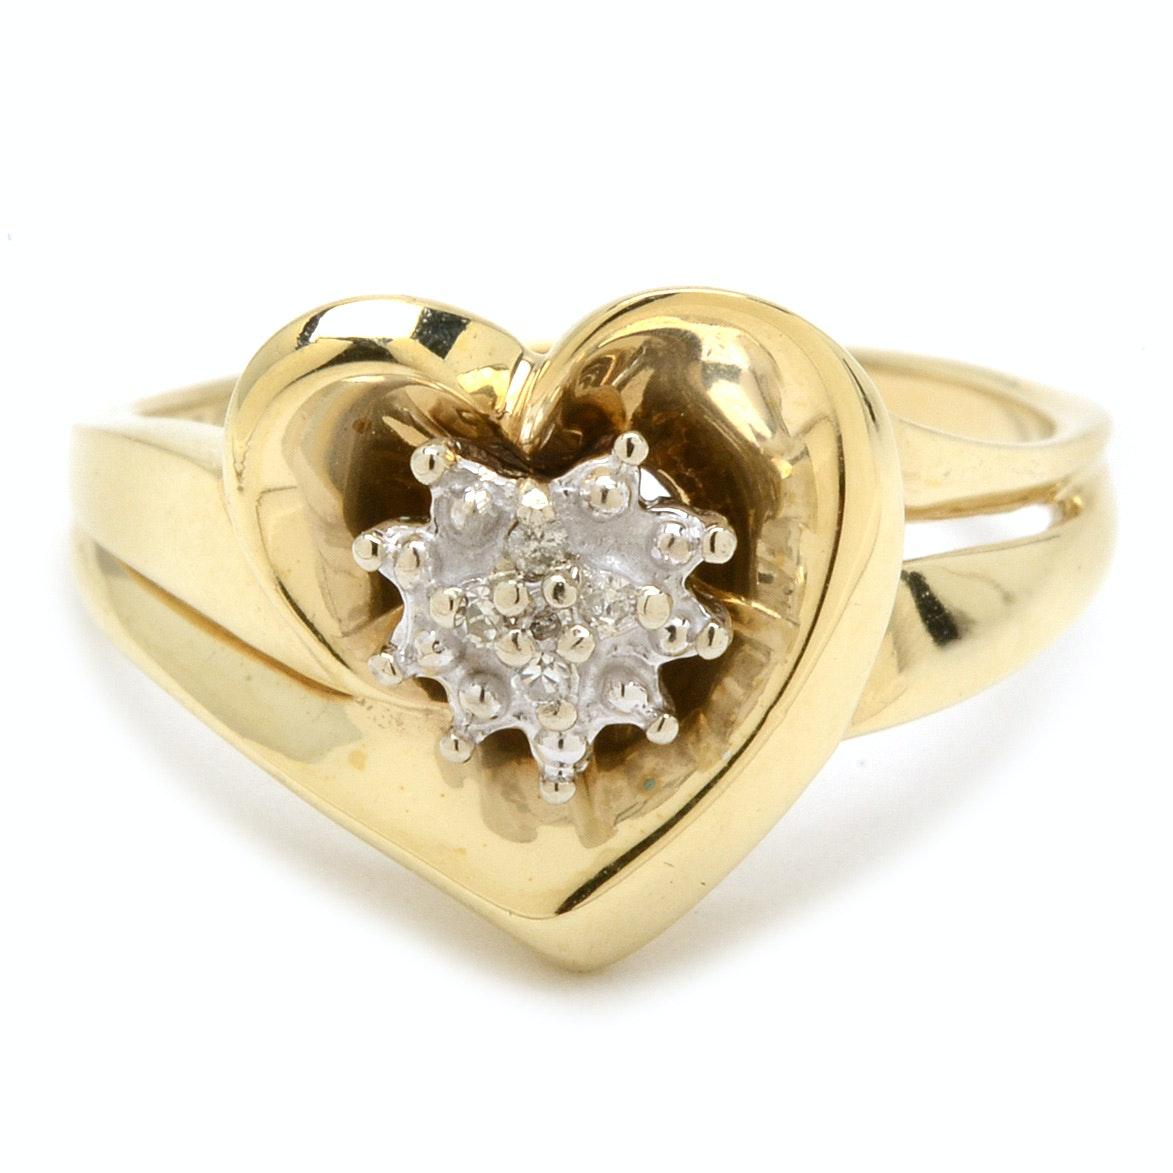 14K Yellow Gold Heart Shaped Diamond Ring